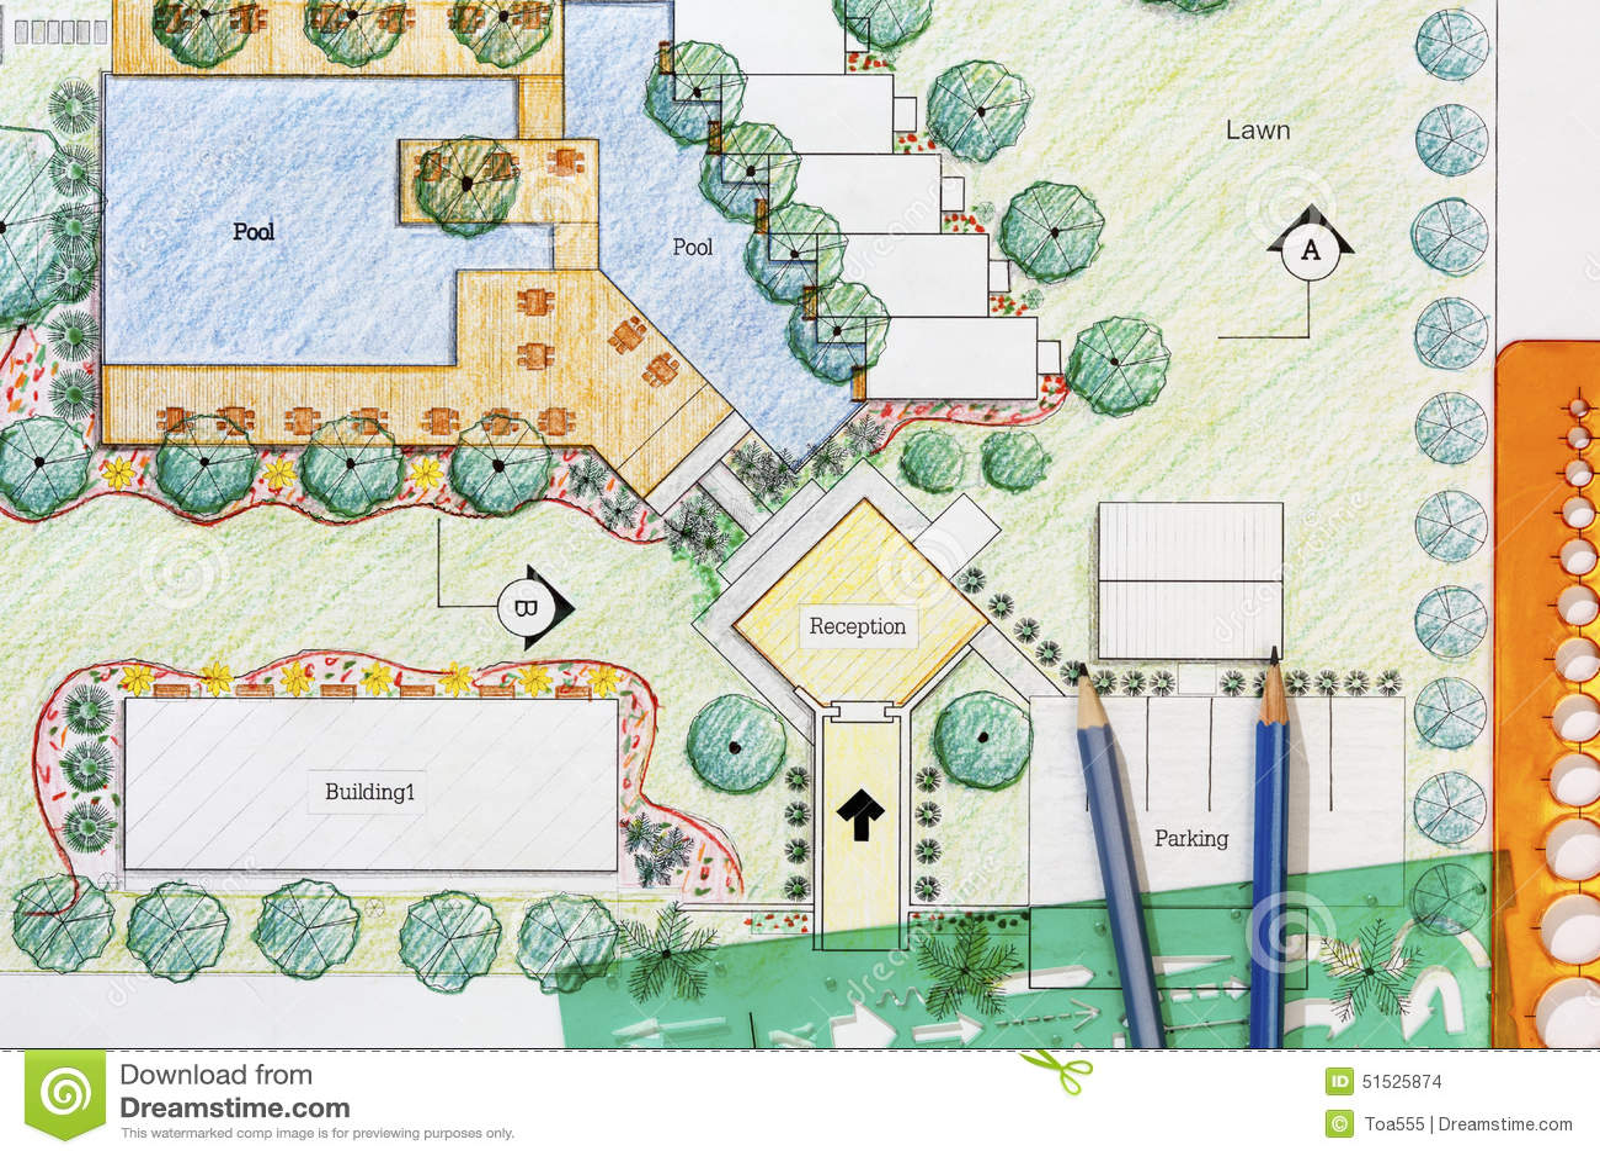 Landscape Architect Design Hotel Resort Plan Stock Photo